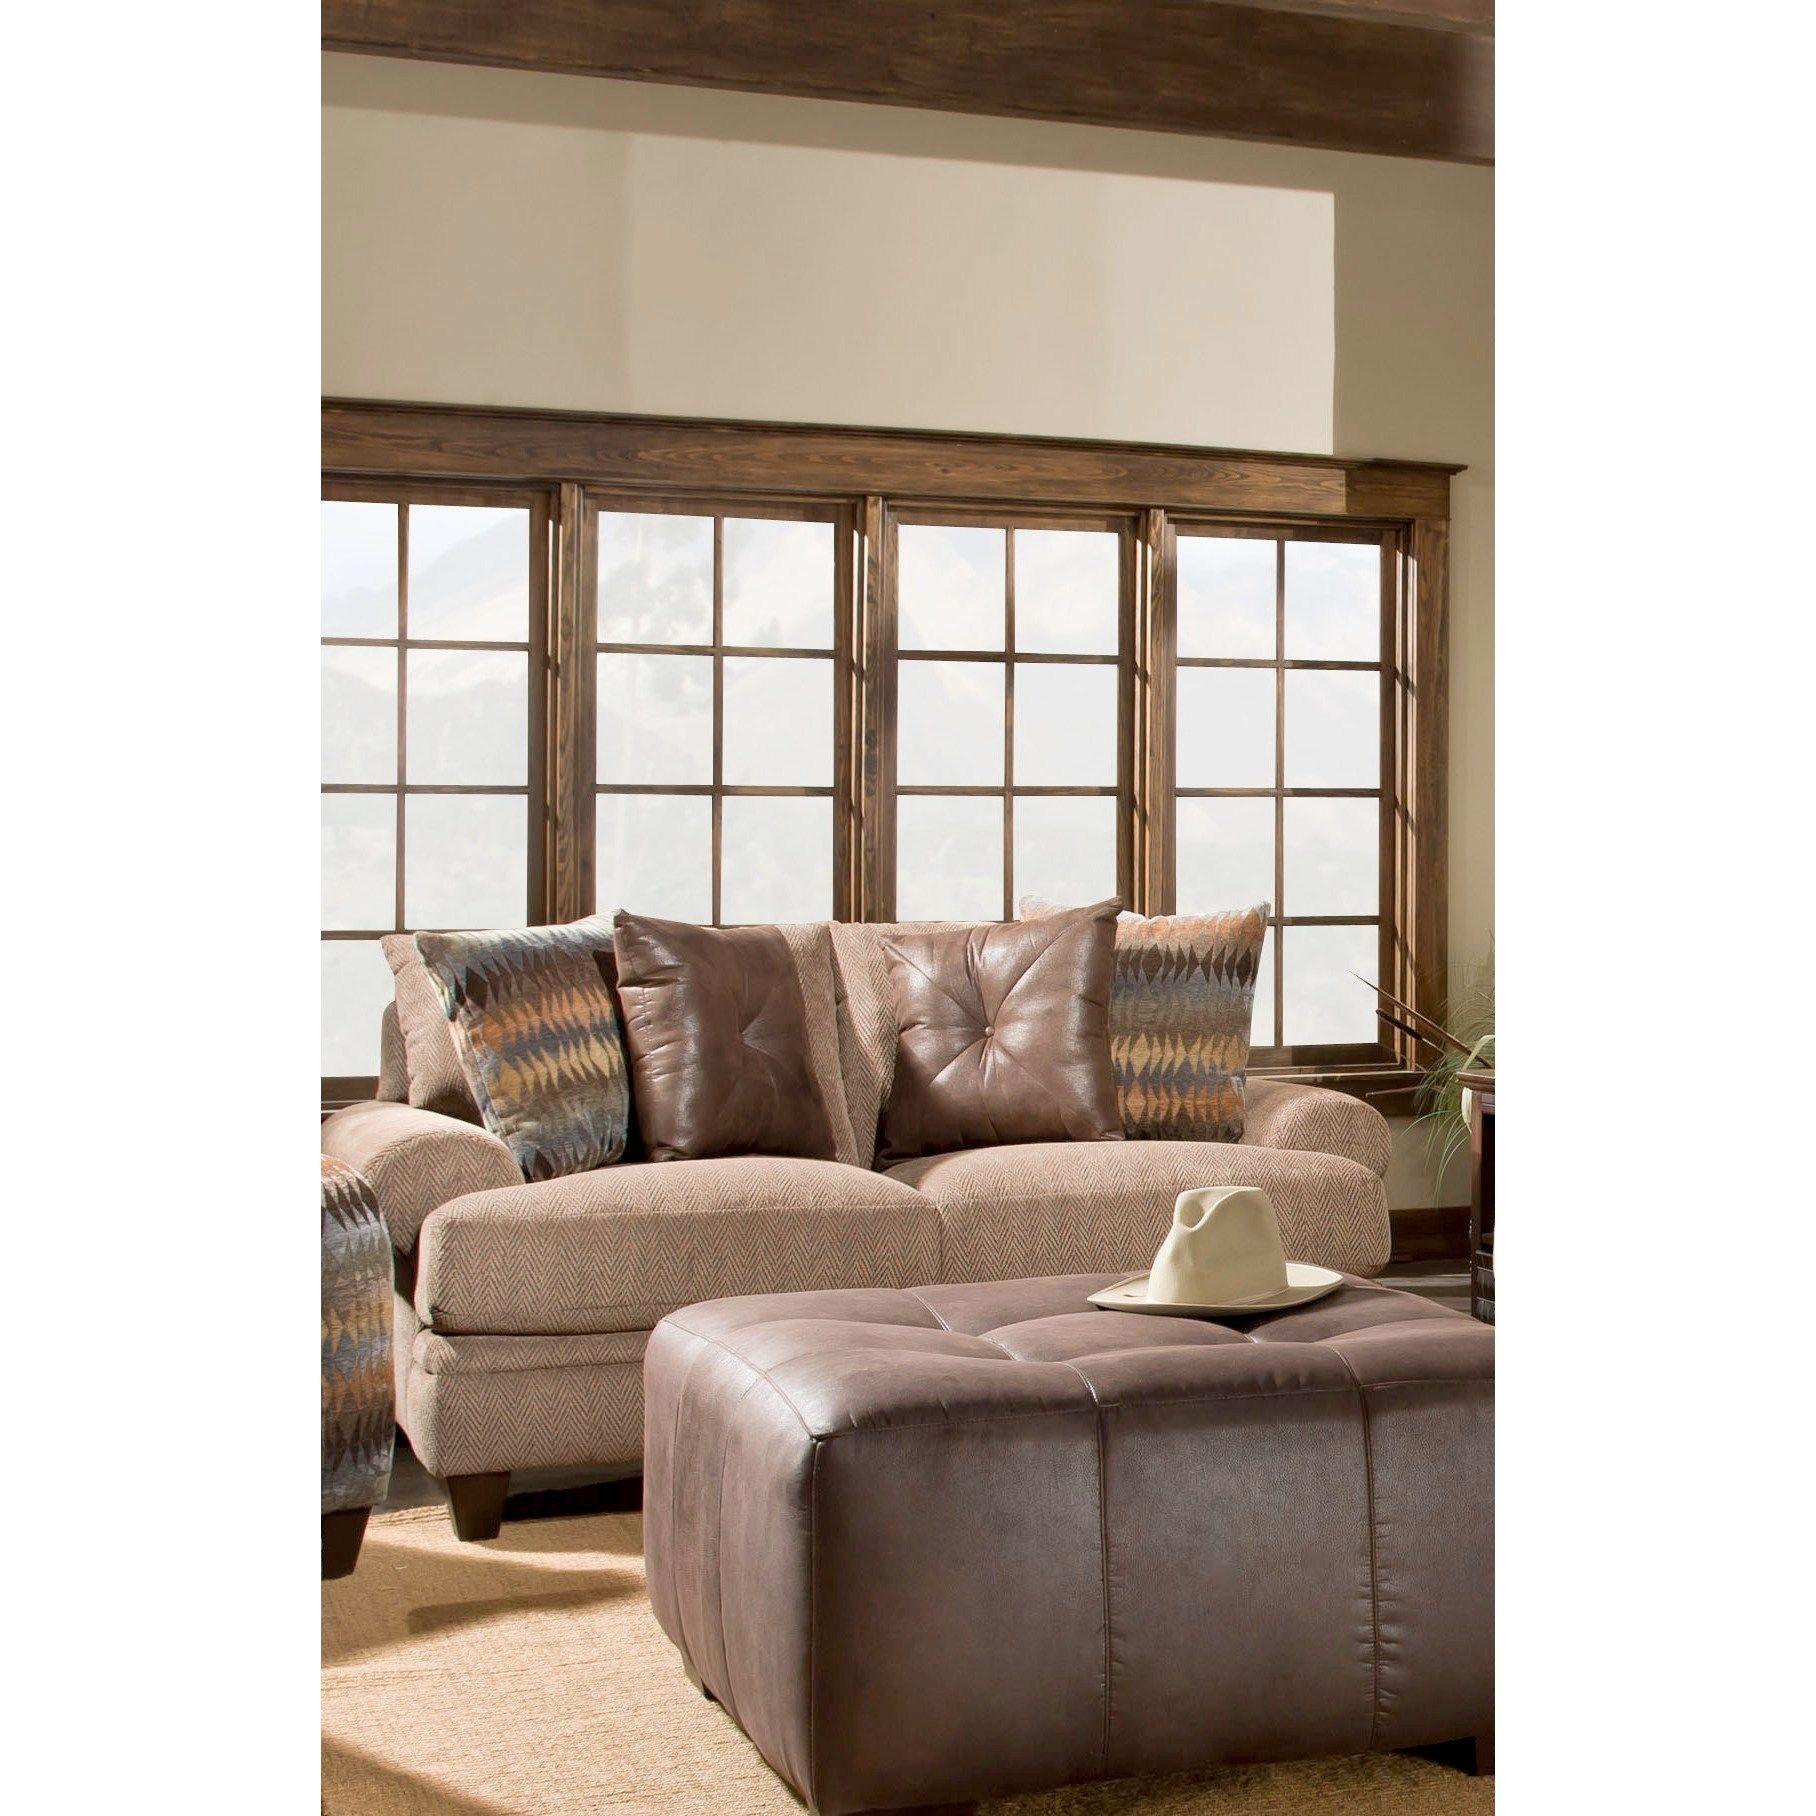 Sofa Trendz Allison Taupe Cotton blended Loveseat